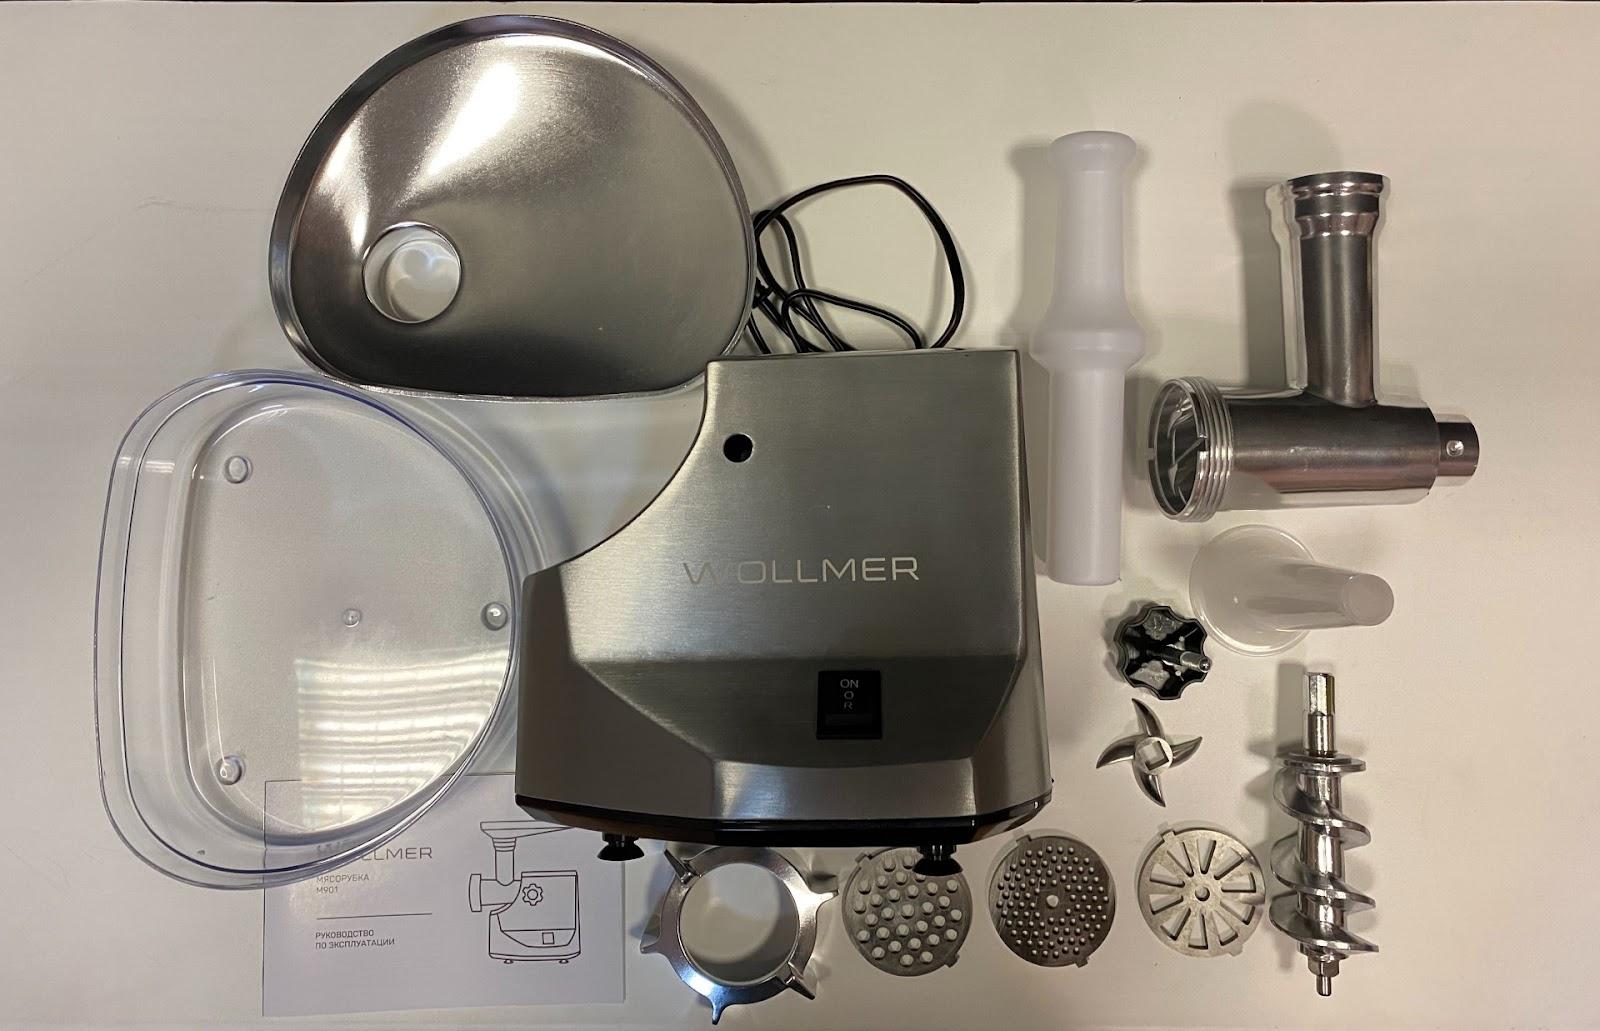 Мясорубка  Wollmer M901 все комплектующие